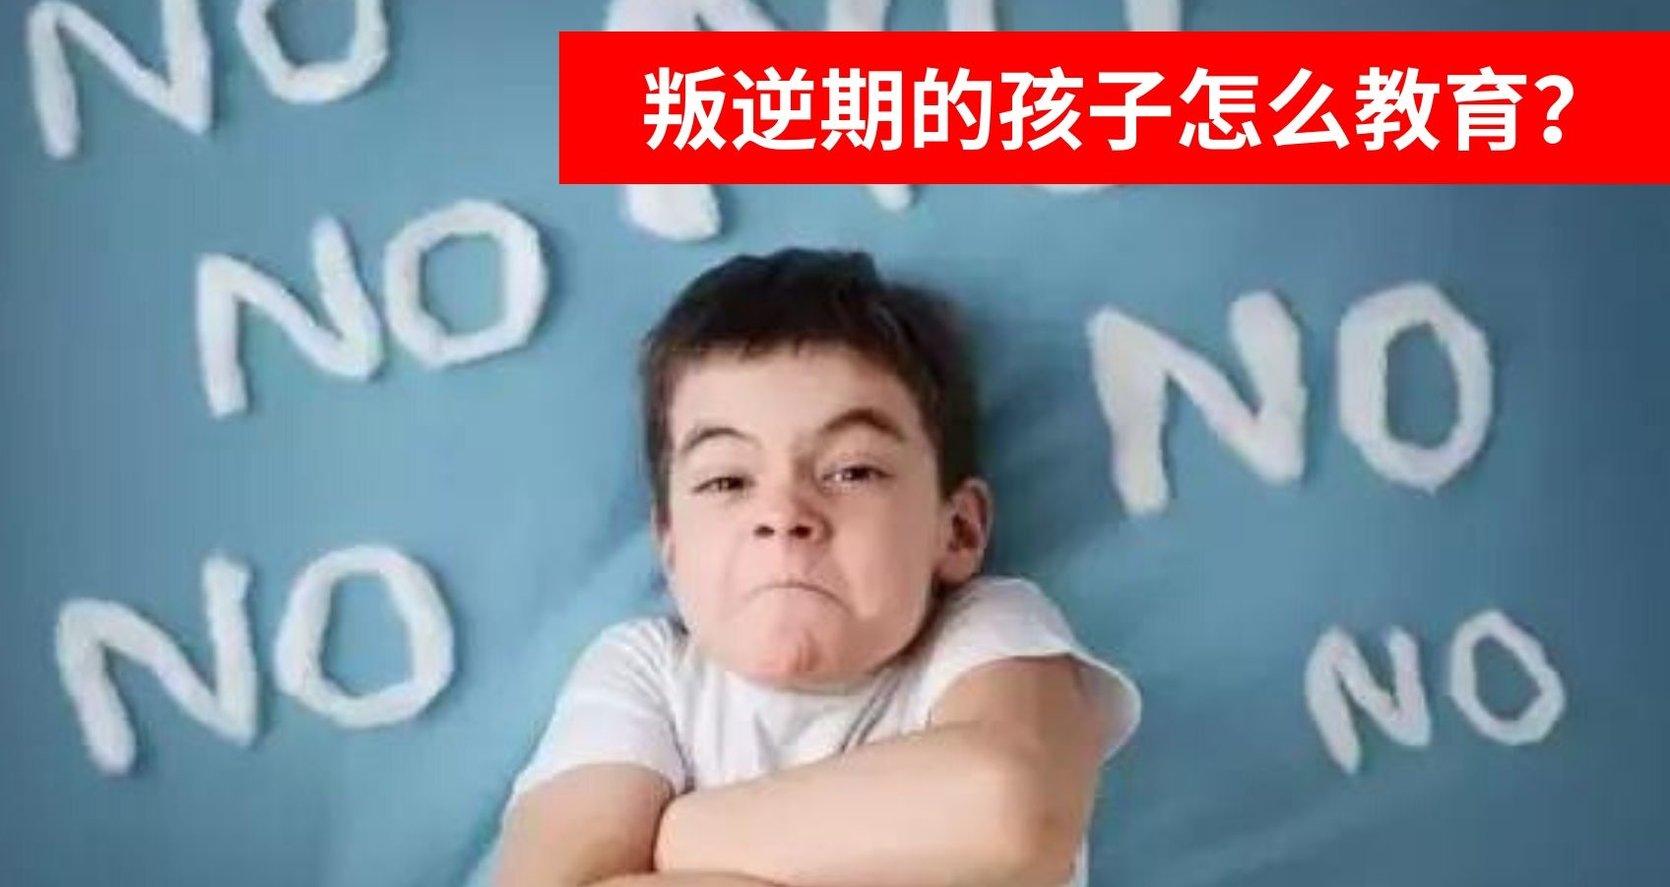 kids-problem-12